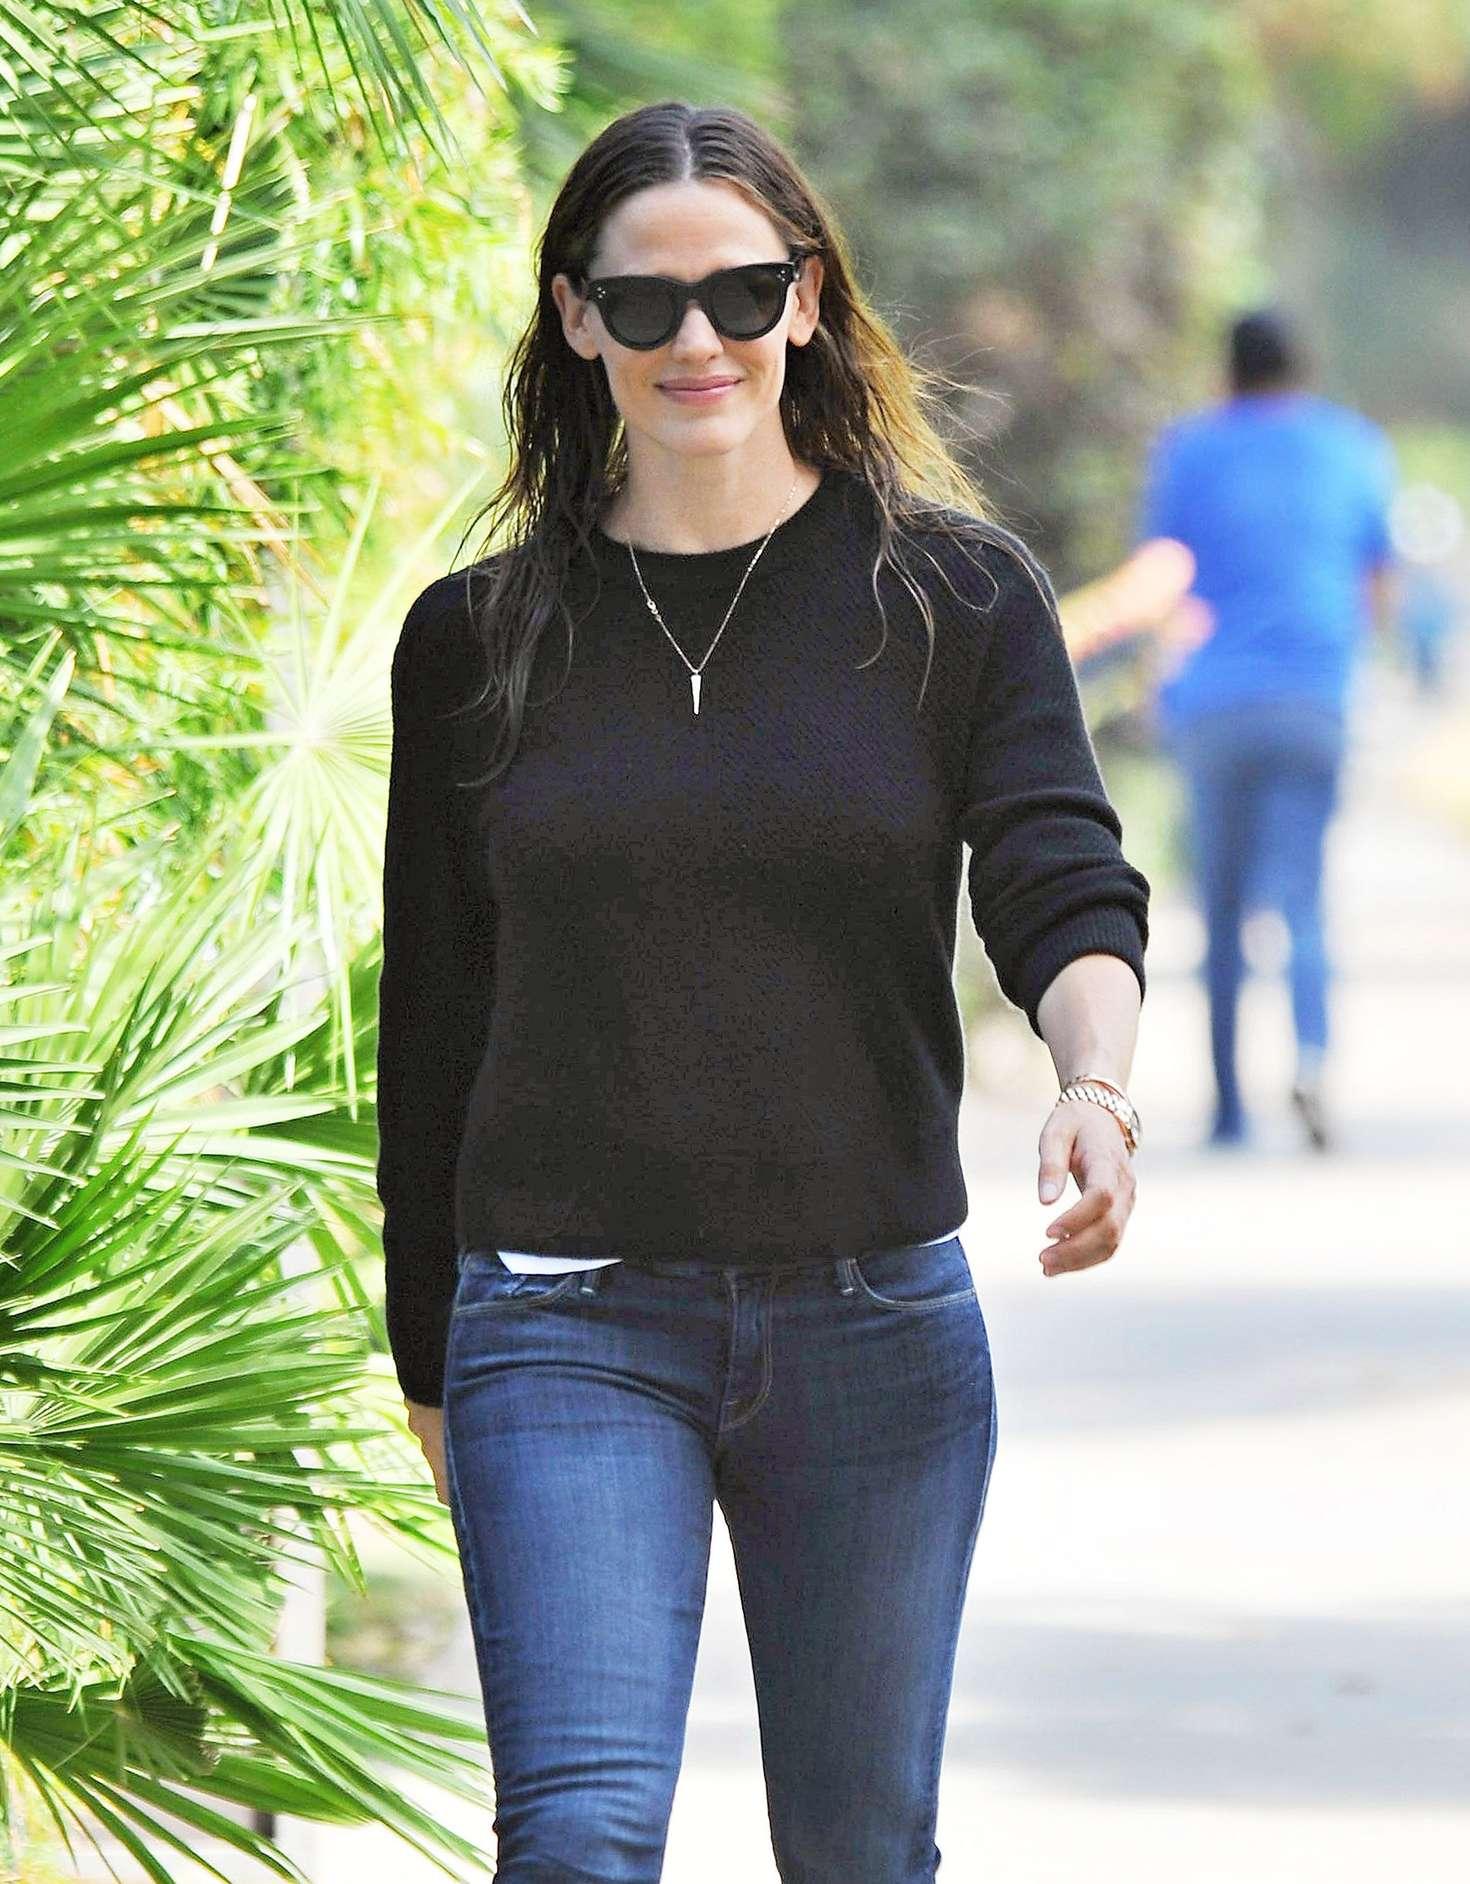 Jennifer Garner 2016 : Jennifer Garner Booty in Jeans -11